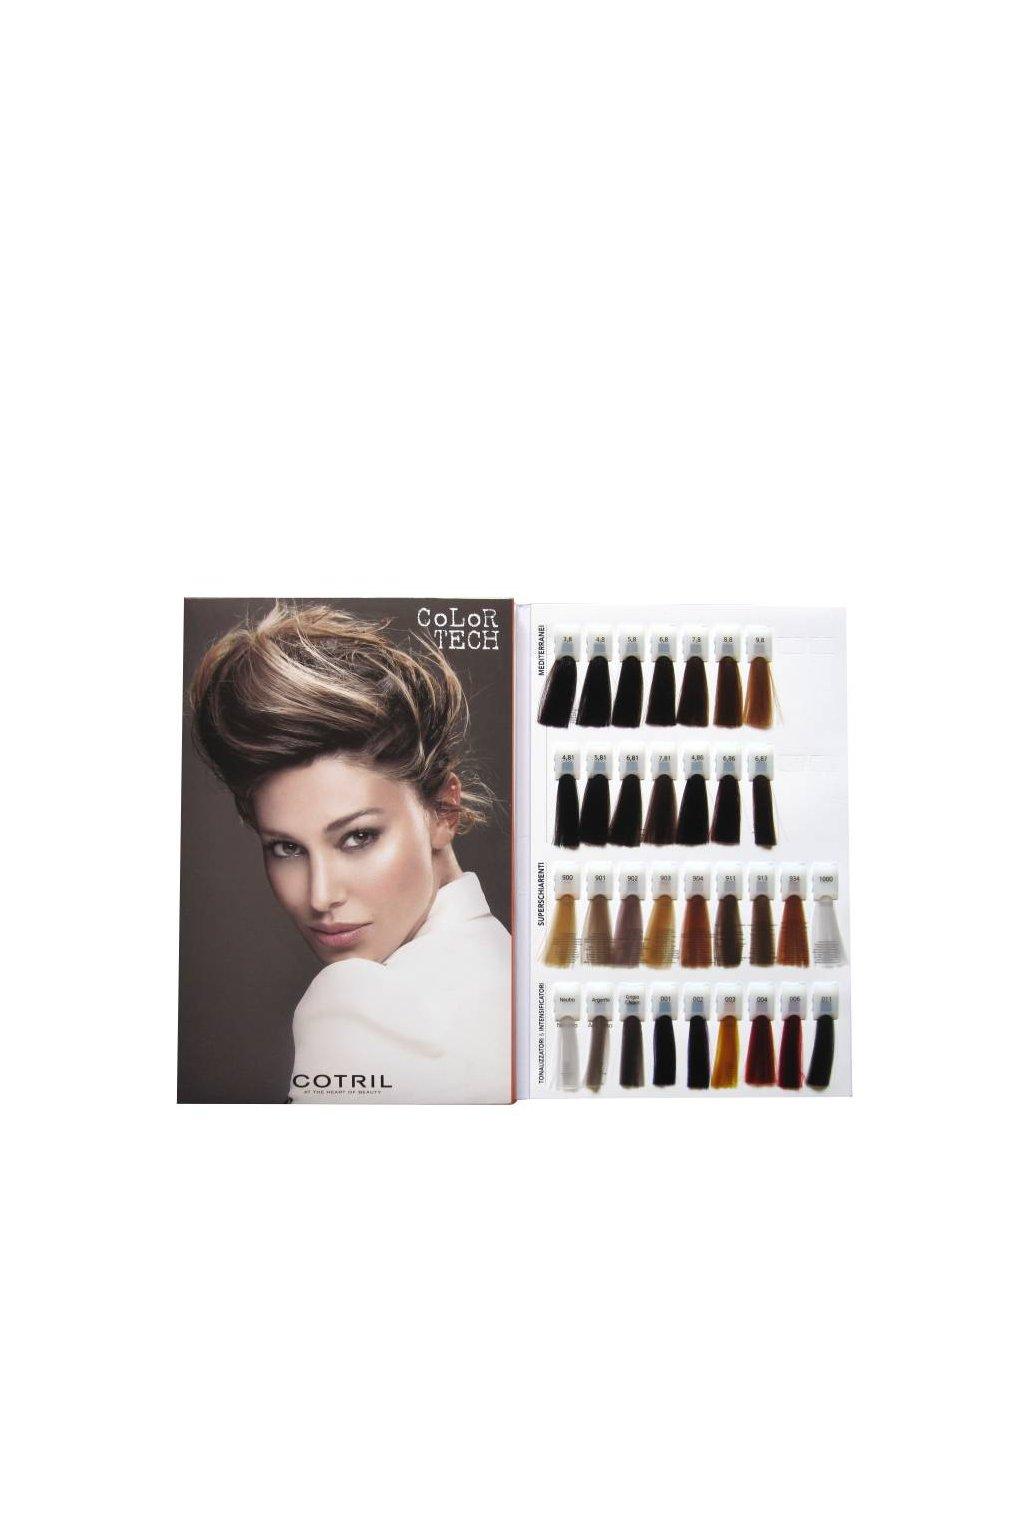 vlas CL colortech velky